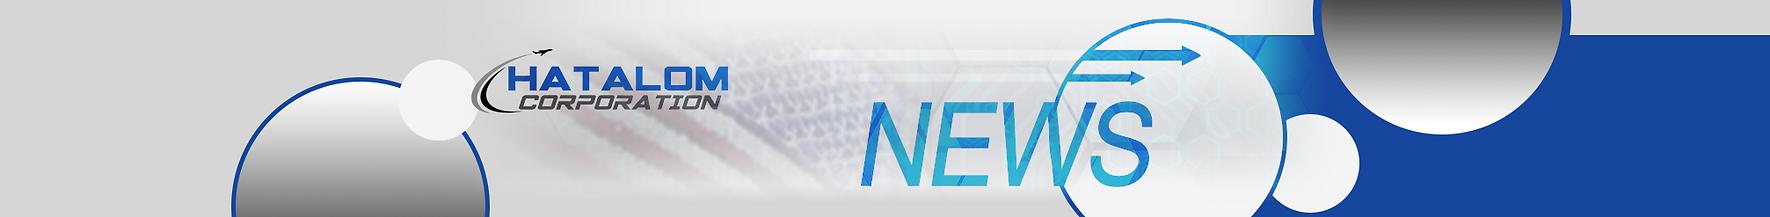 NewsBanner2.PNG